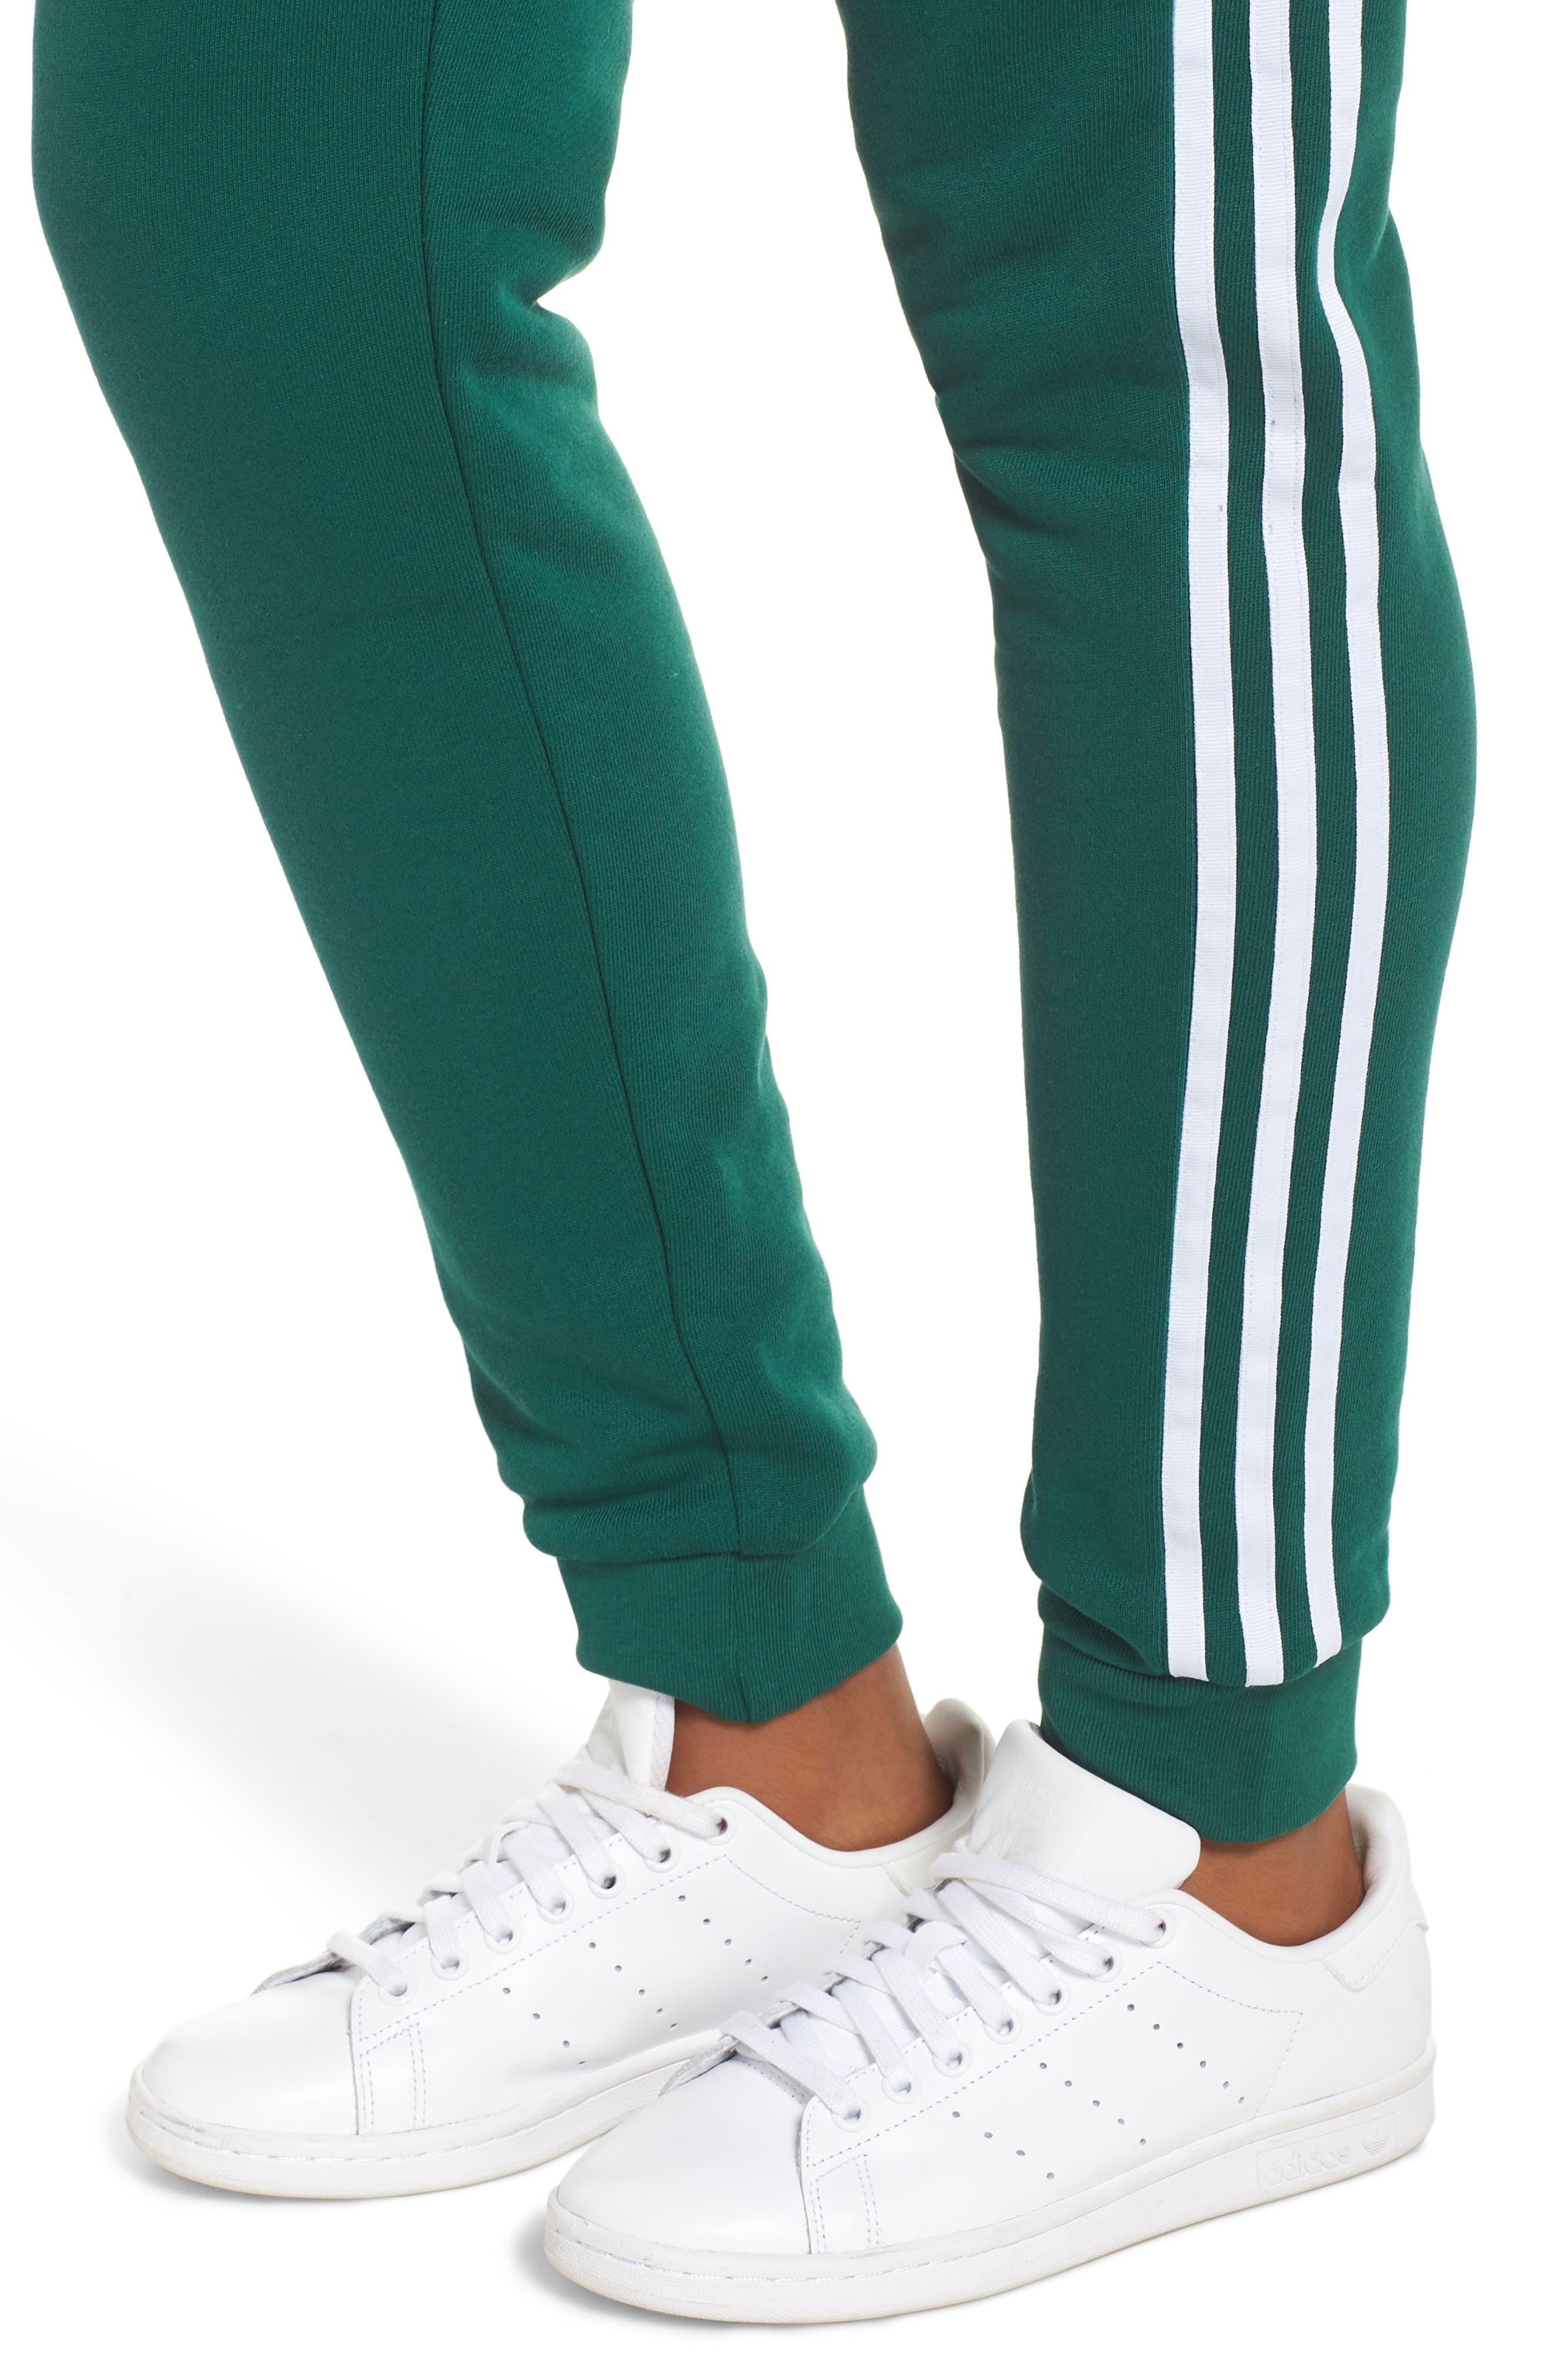 ADIDAS ORIGINALS, Cuffed Track Pants, Alternate thumbnail 5, color, 305